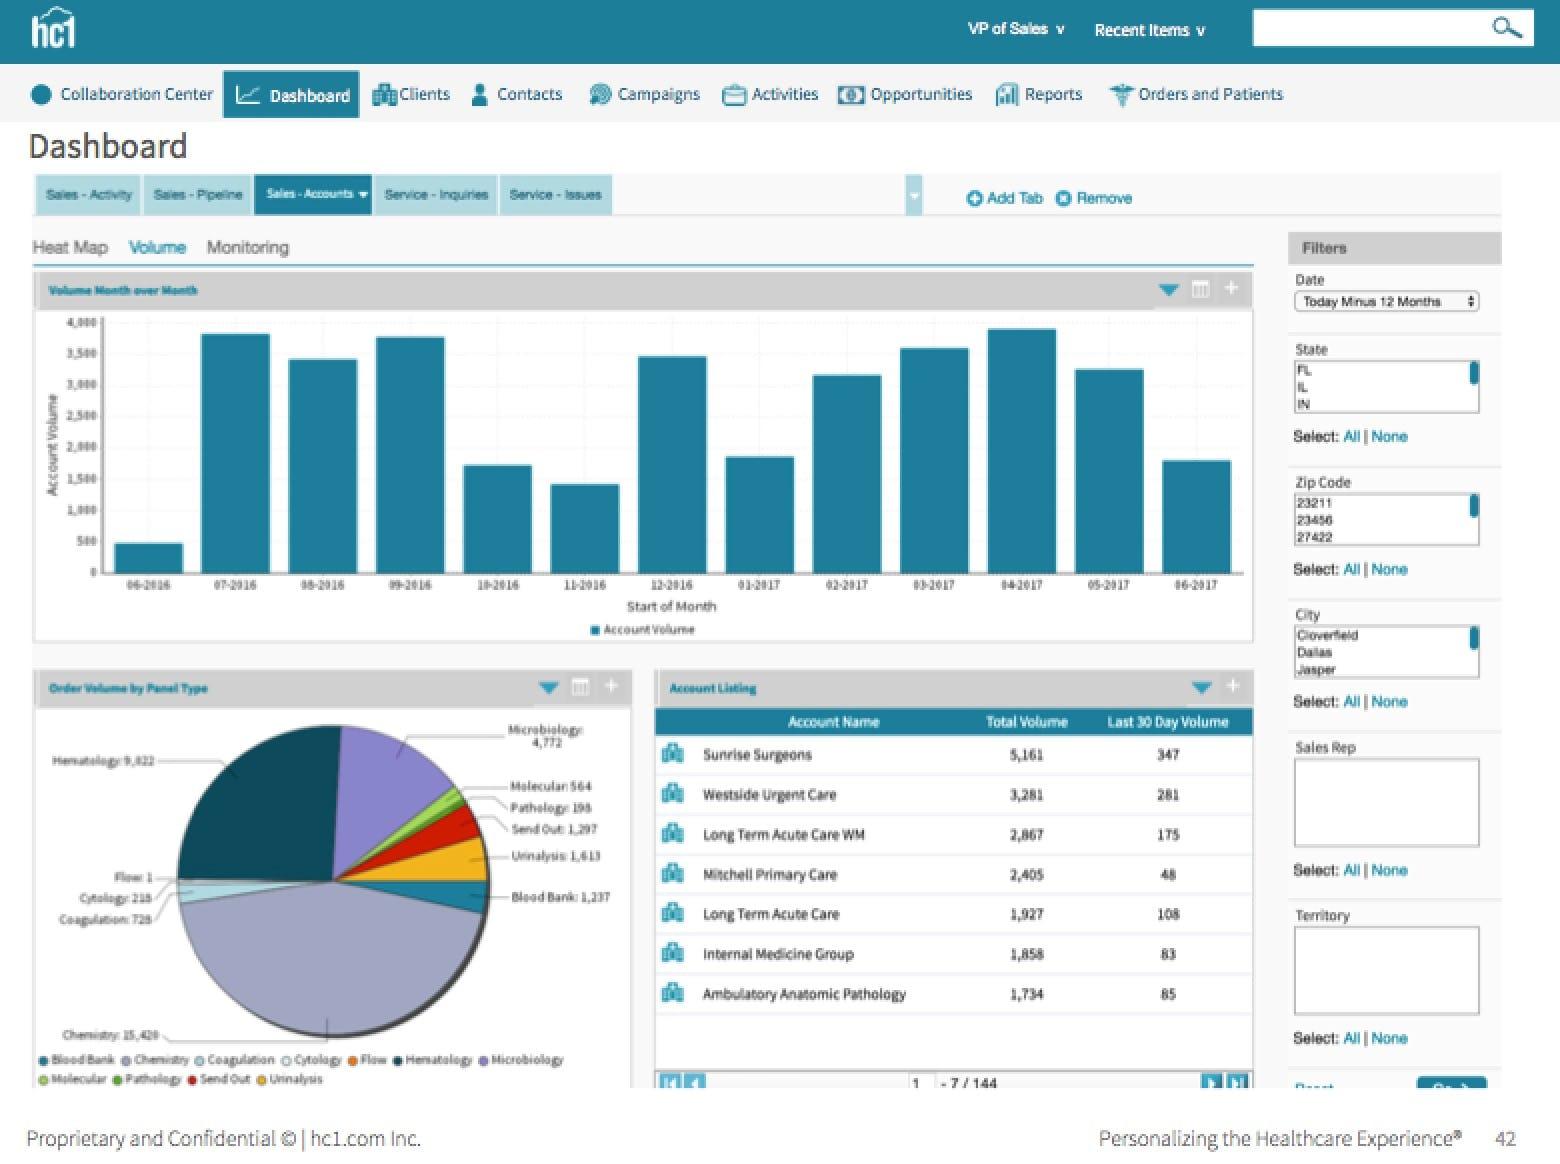 hc1 High-Value Care Platform Software - Sales account - volume dashboard %>